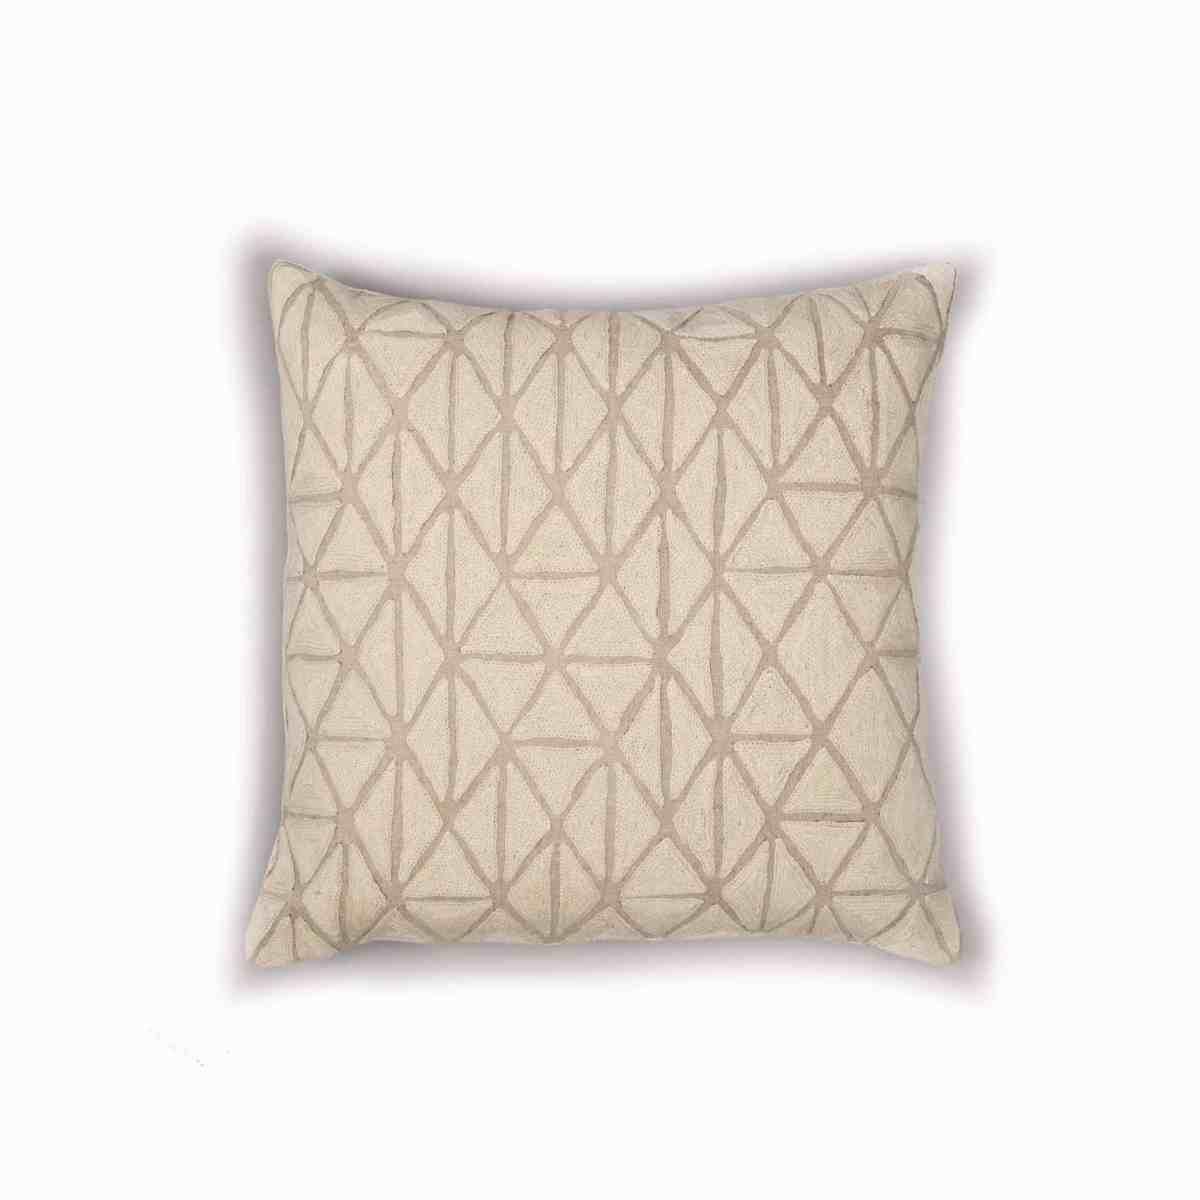 berber-cushion-ecru-natural-linen-1